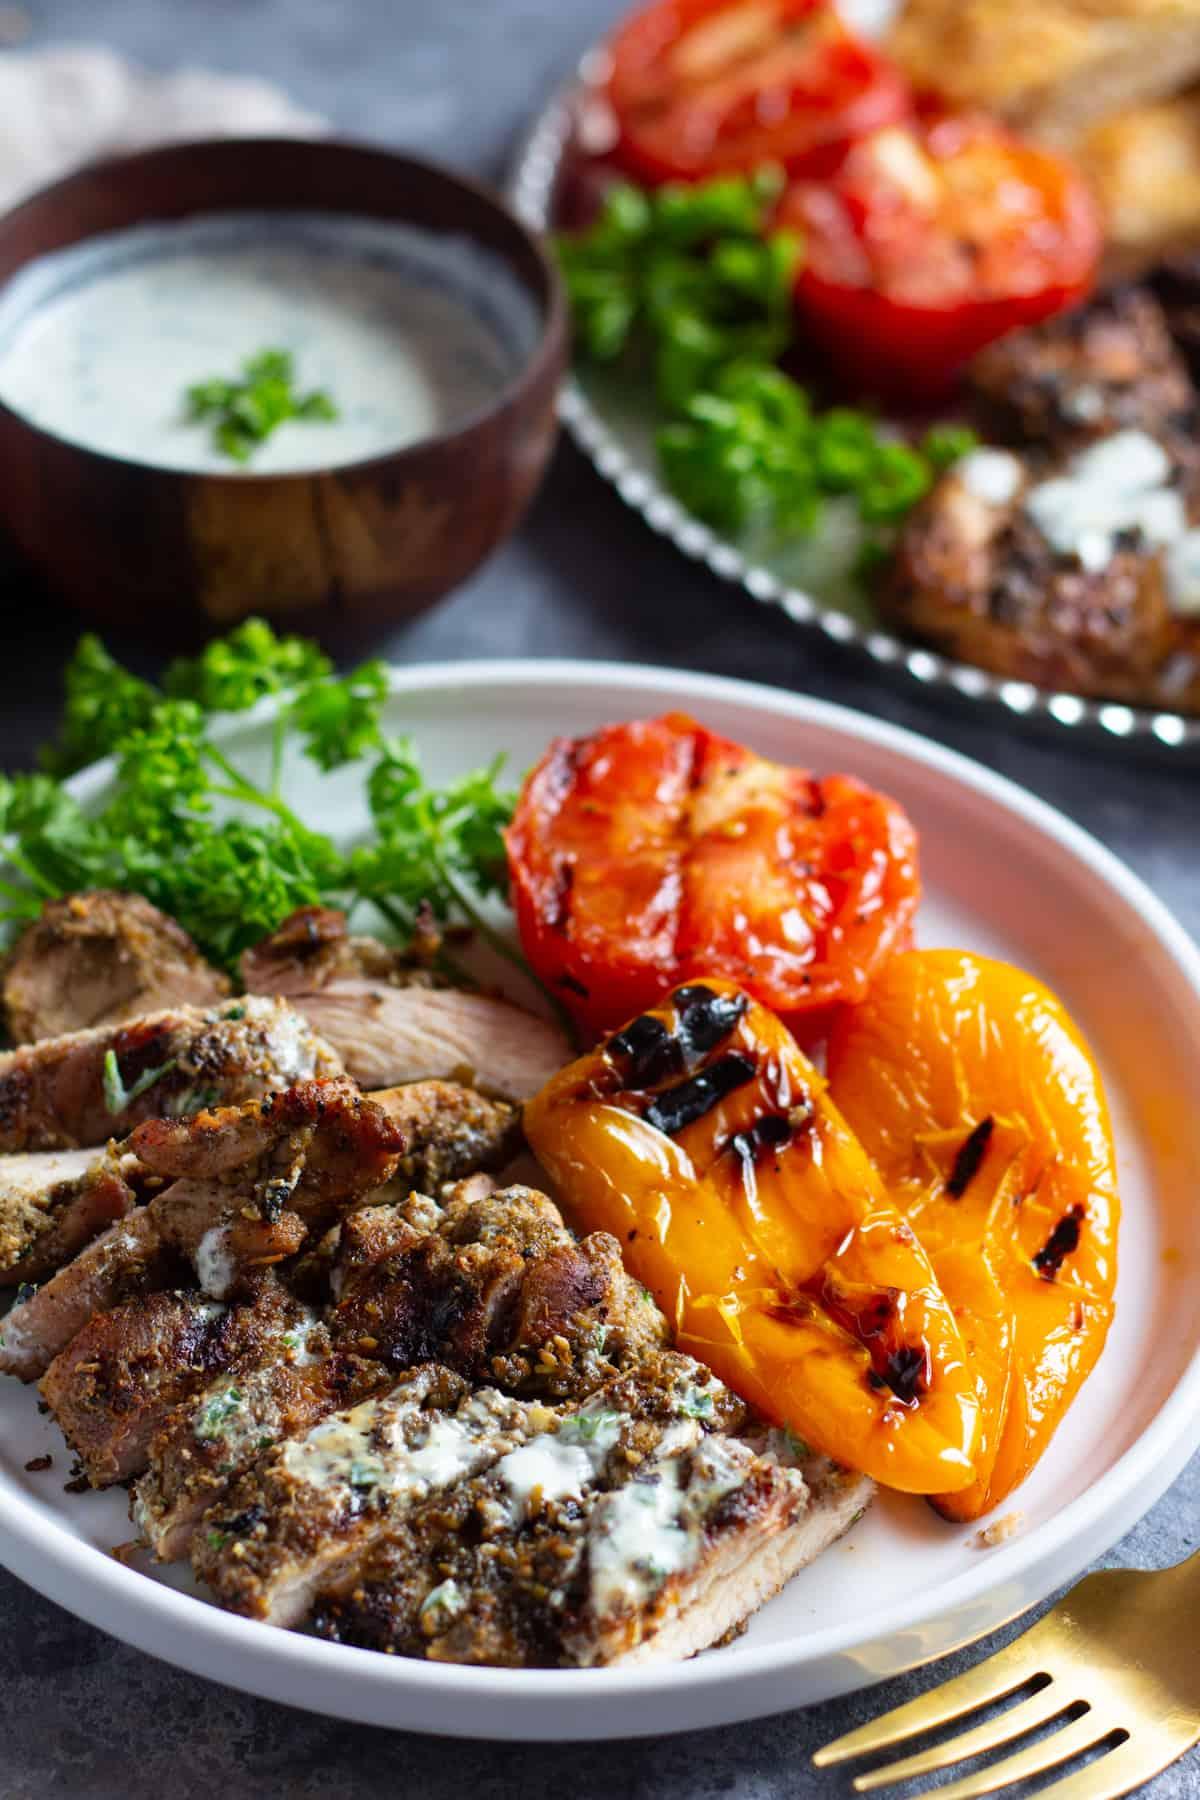 Serve grilled zaatar chicken with grilled vegetables and a herb yogurt sauce.